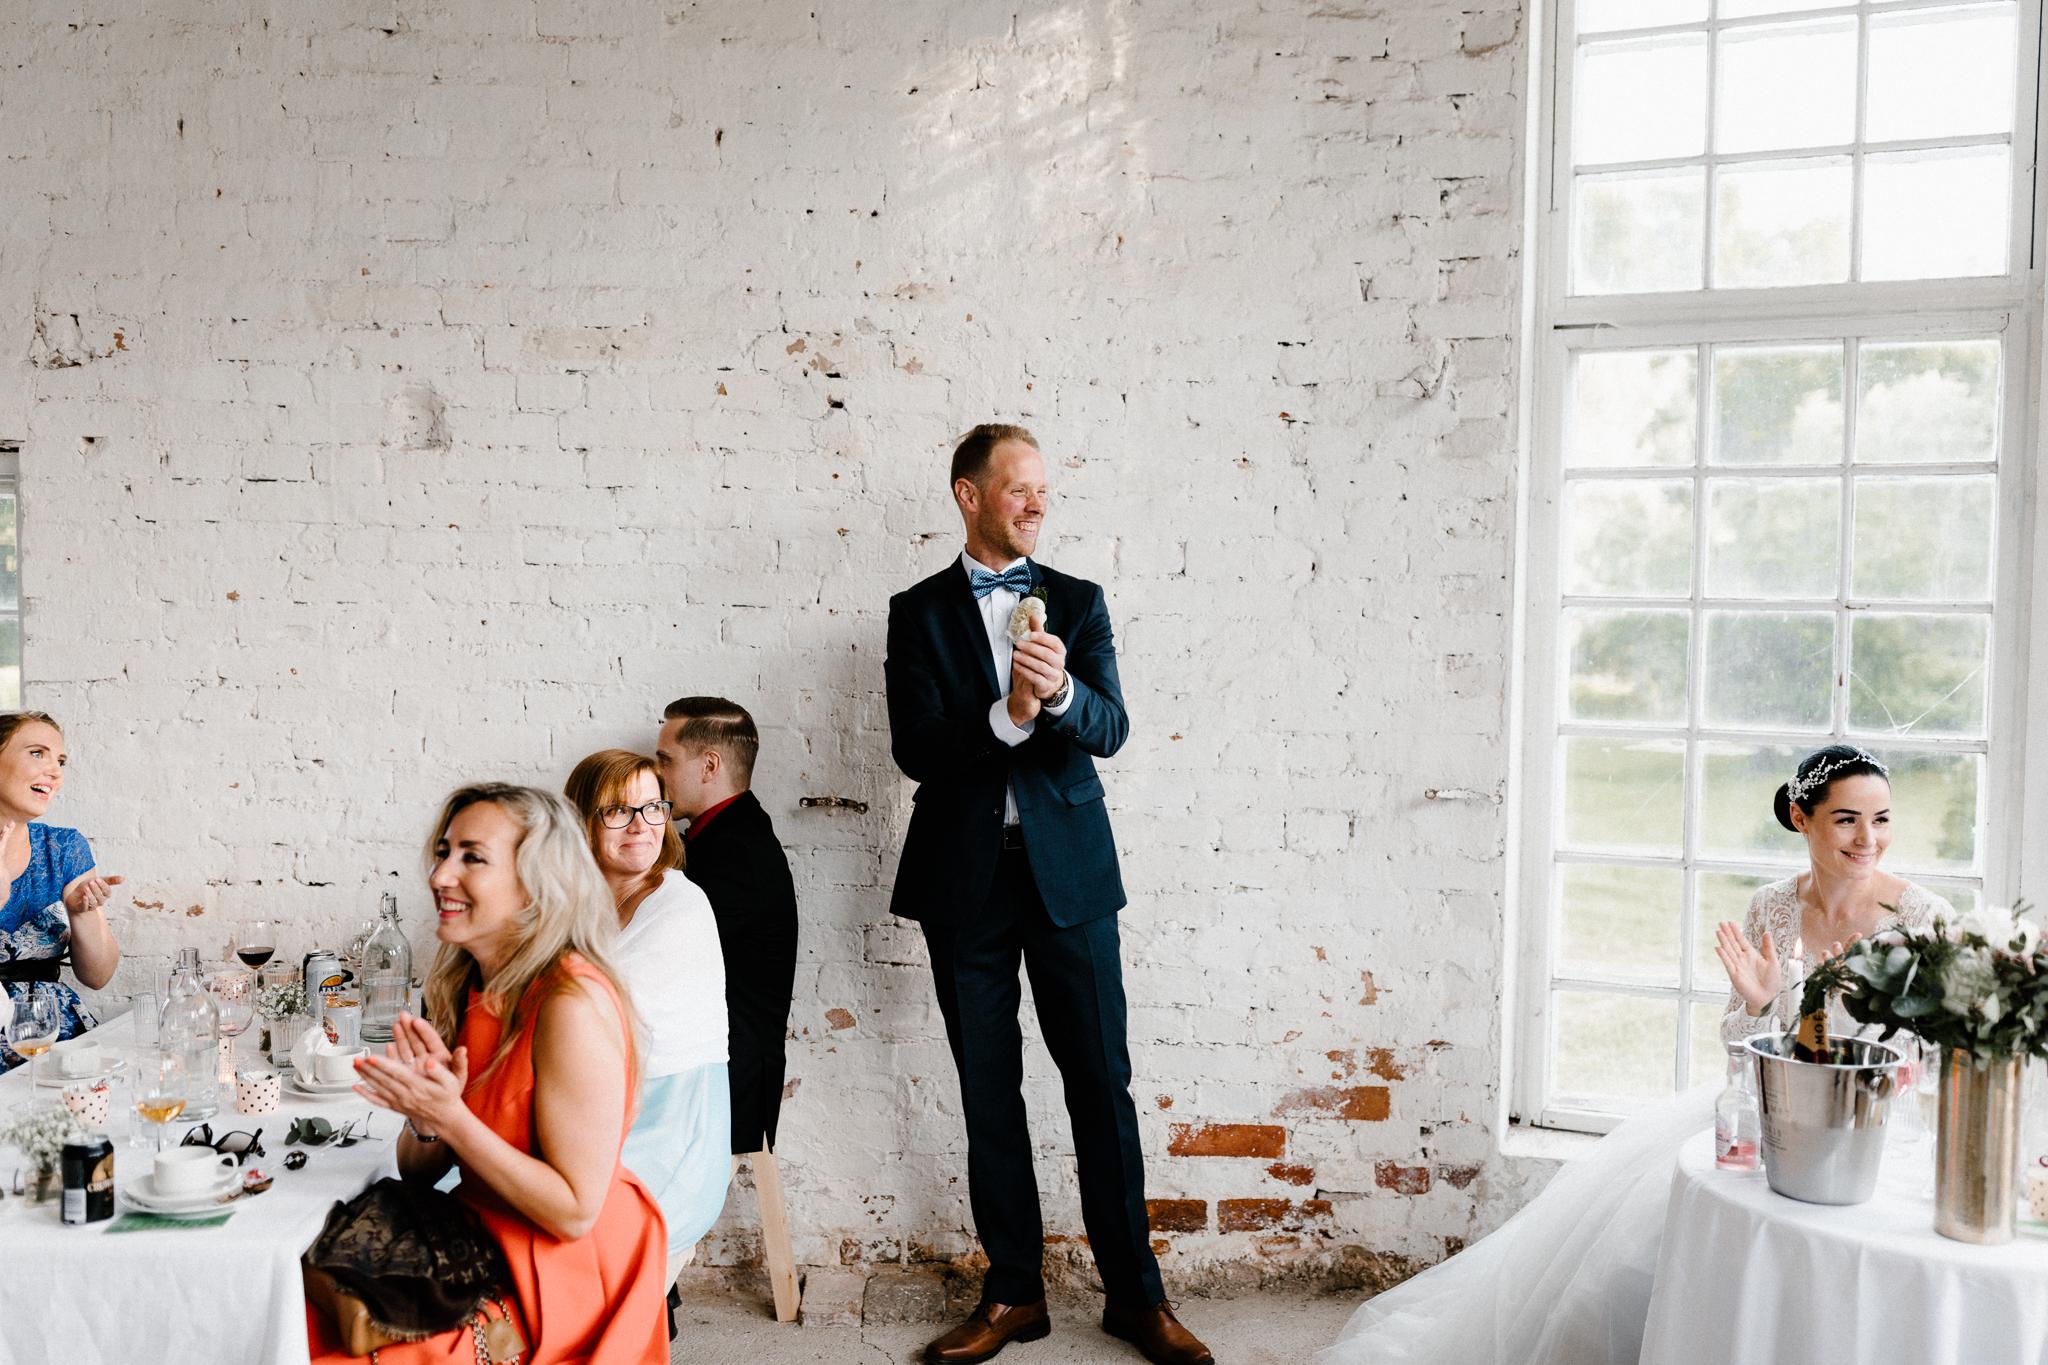 Essi + Ville   Oitbacka Gården   by Patrick Karkkolainen Wedding Photography-269.jpg